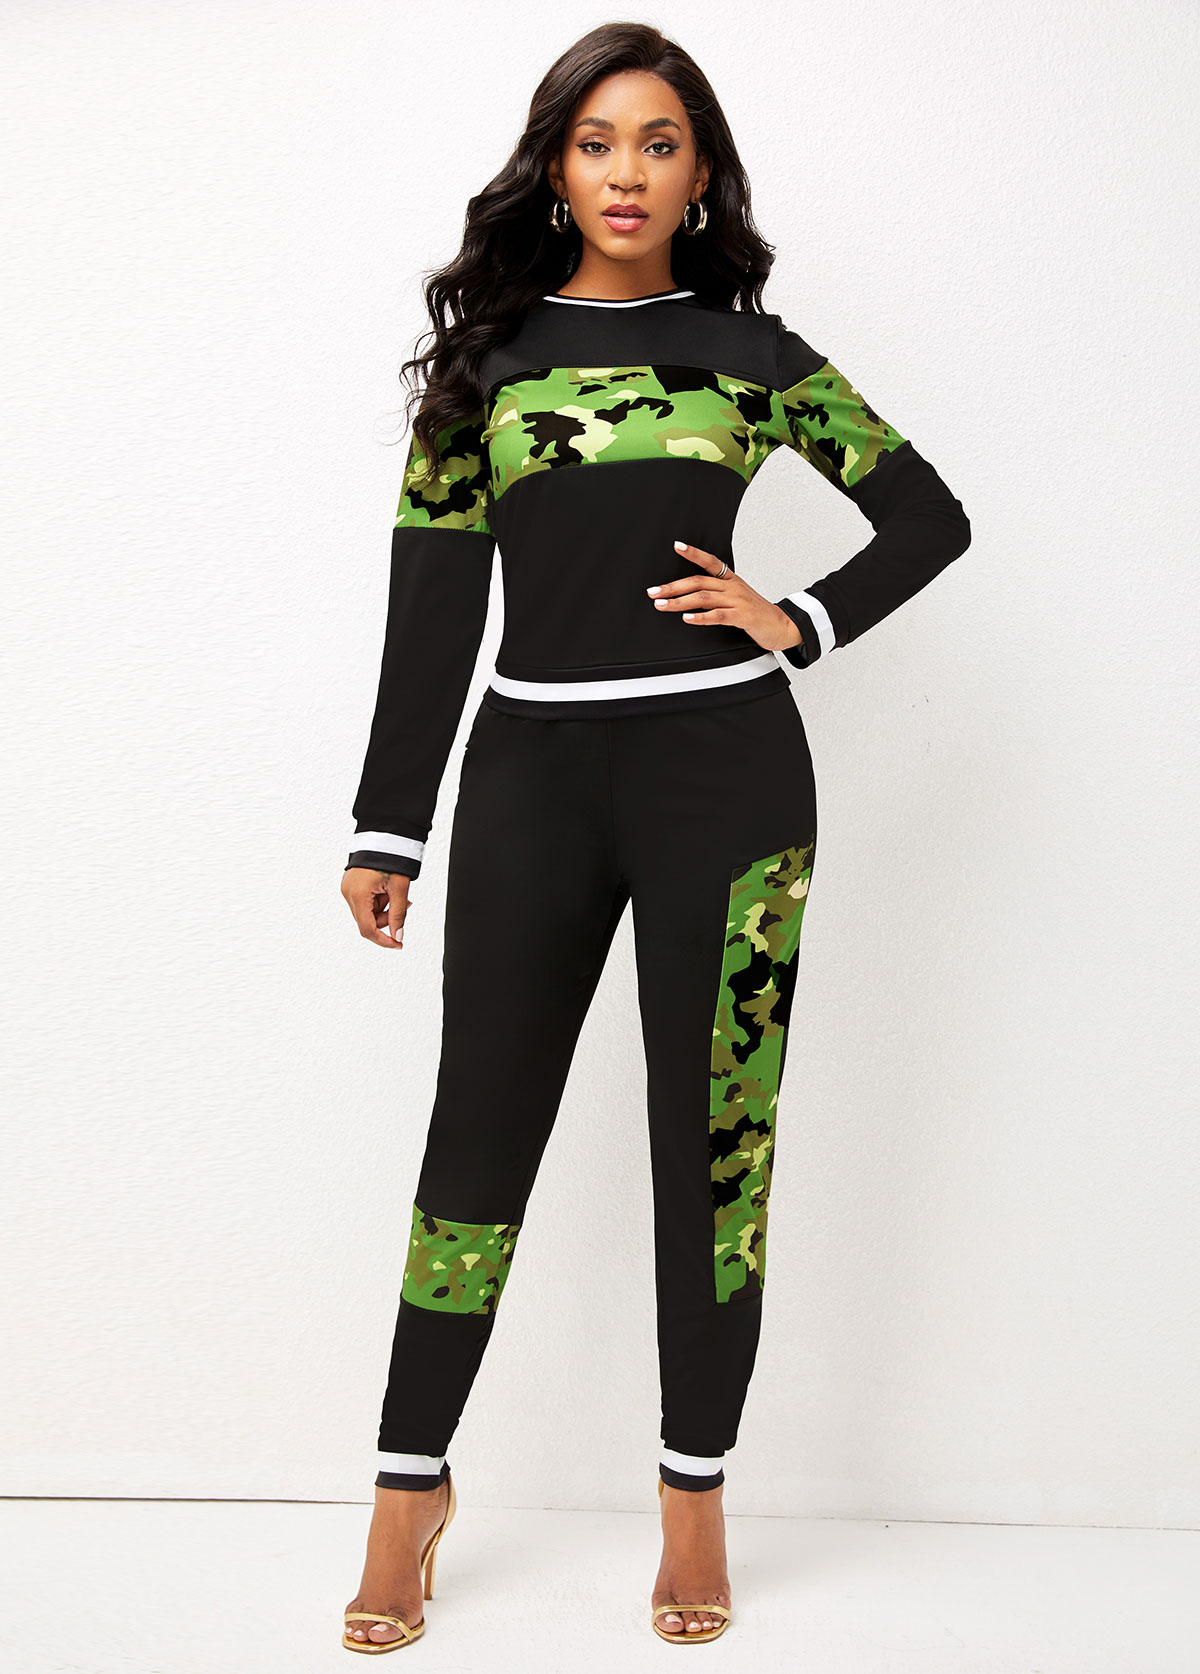 Contrast Camouflage Print Long Sleeve Sweatsuit